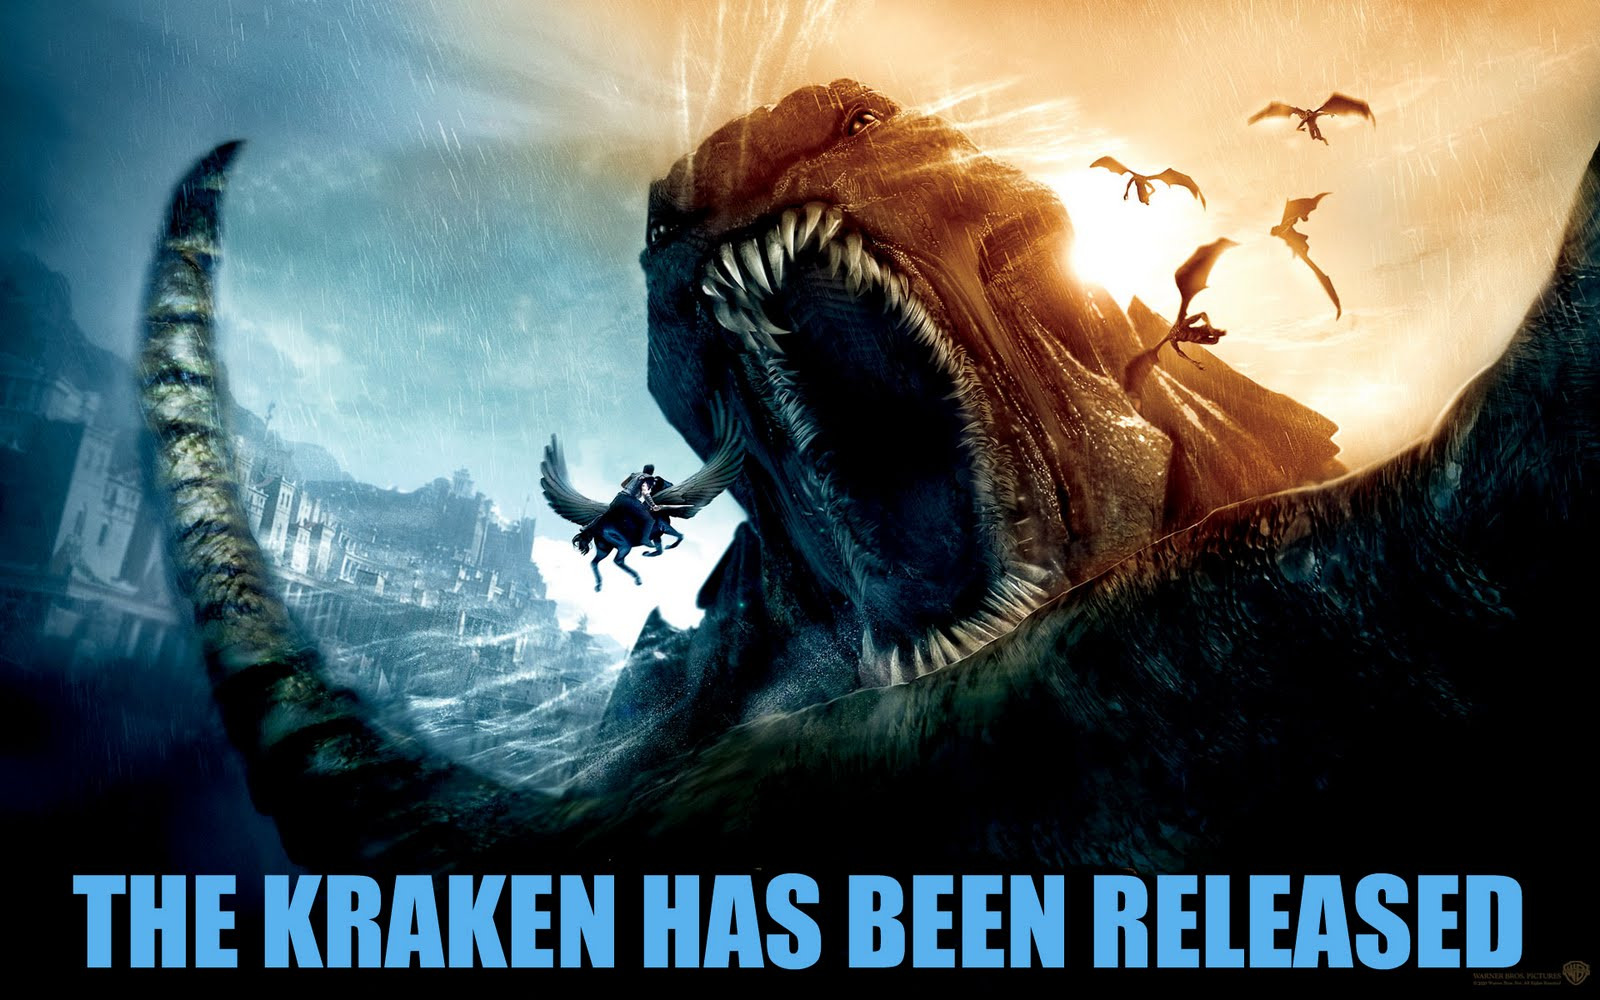 Release+The+Kraken+copy.jpg